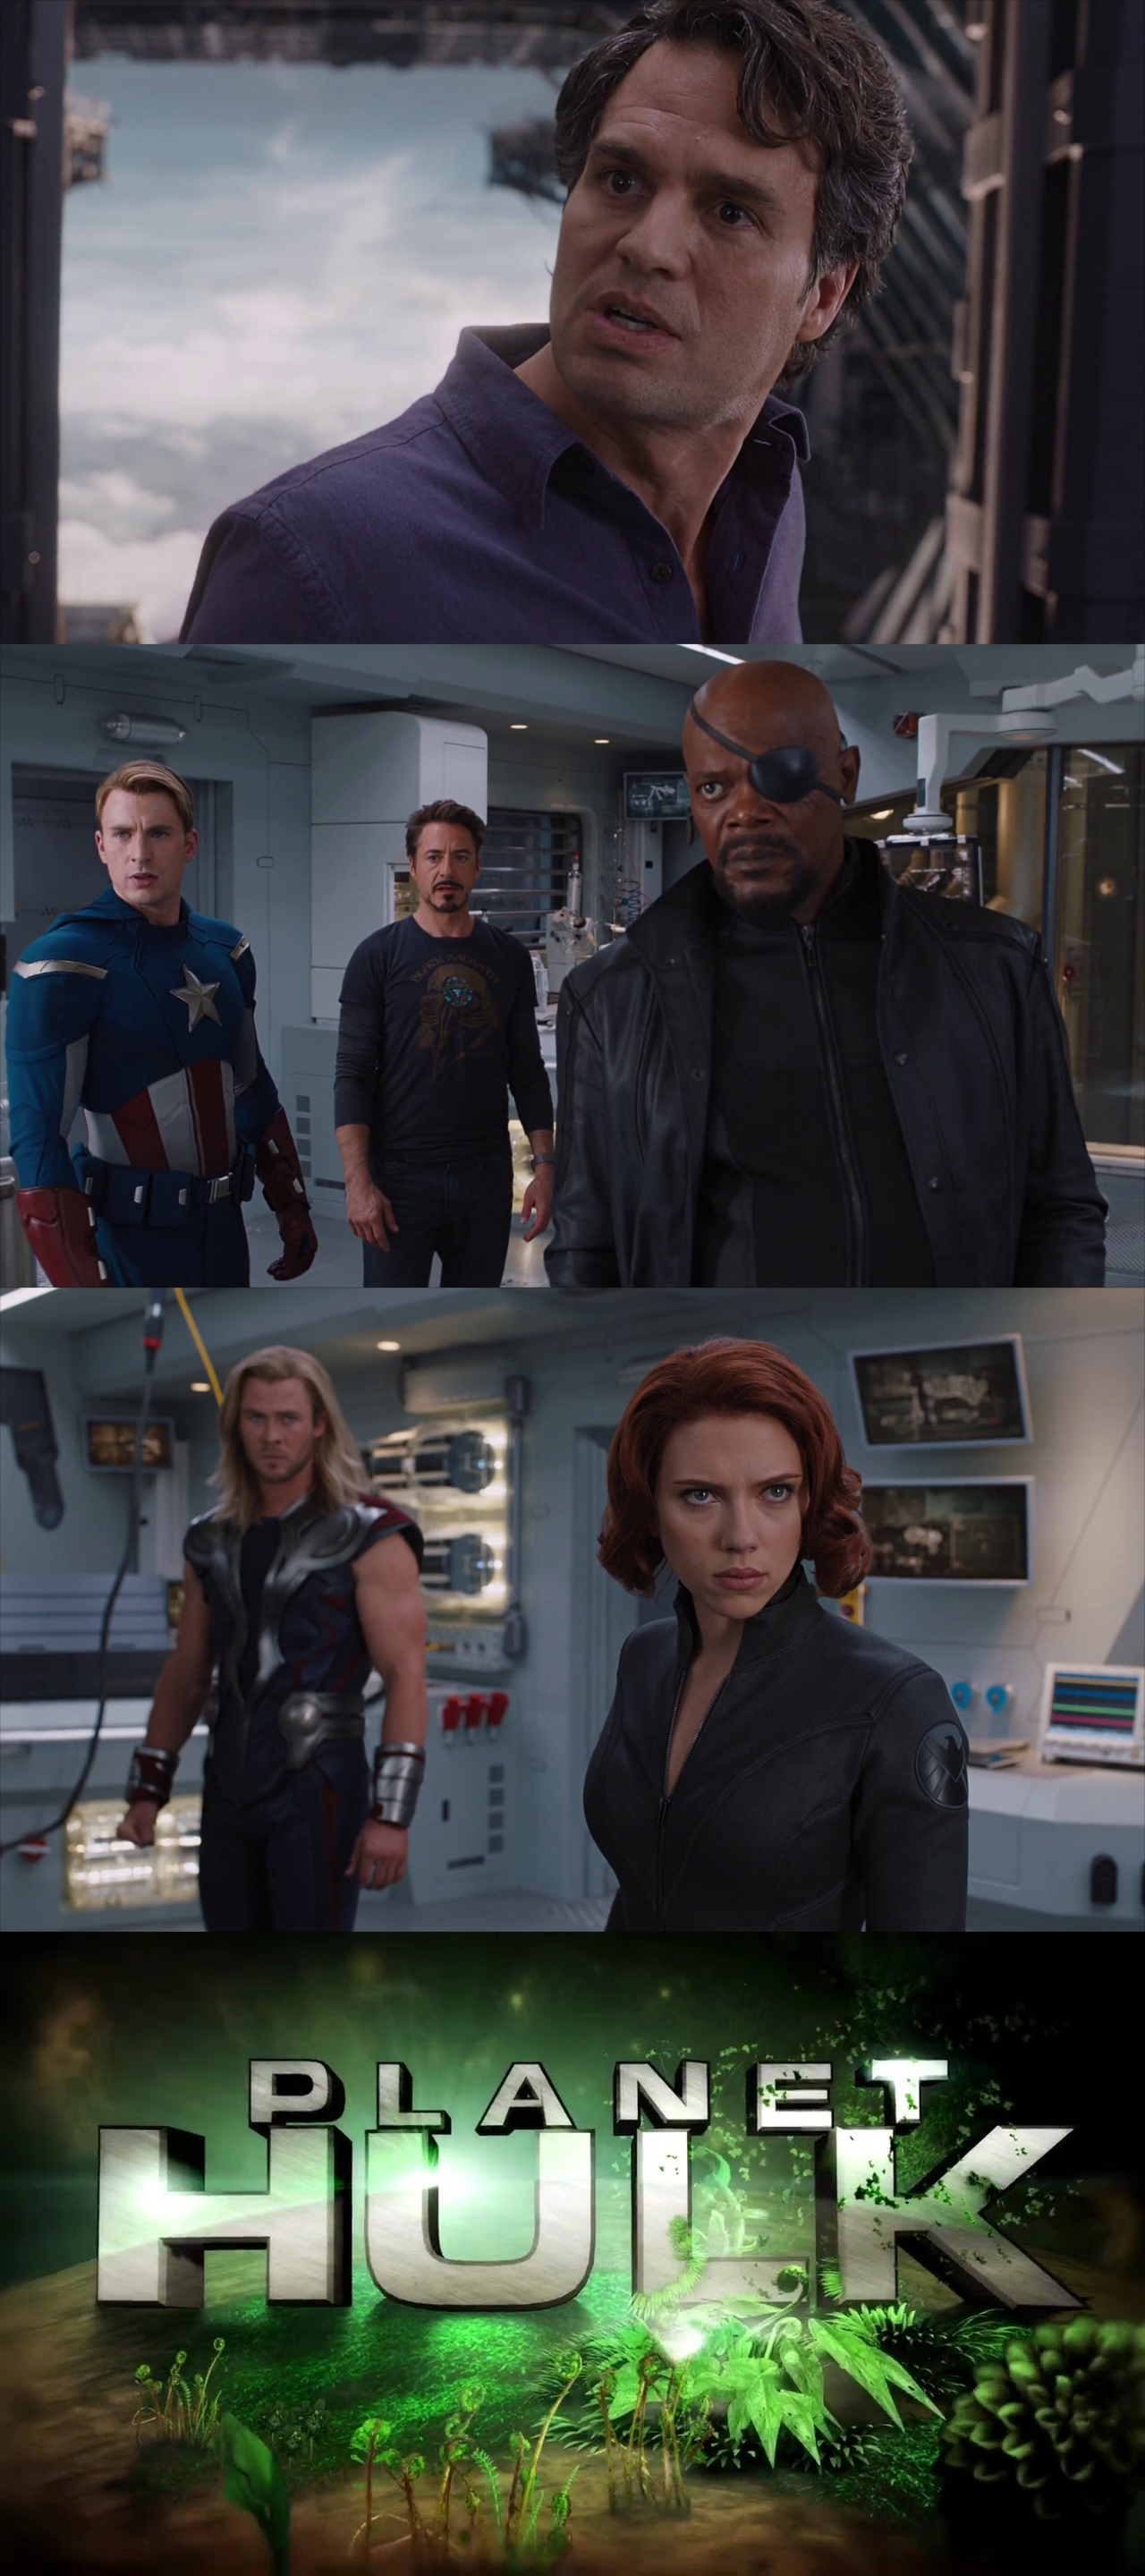 Planet Hulk Template Captain America Civil War 4 Pane